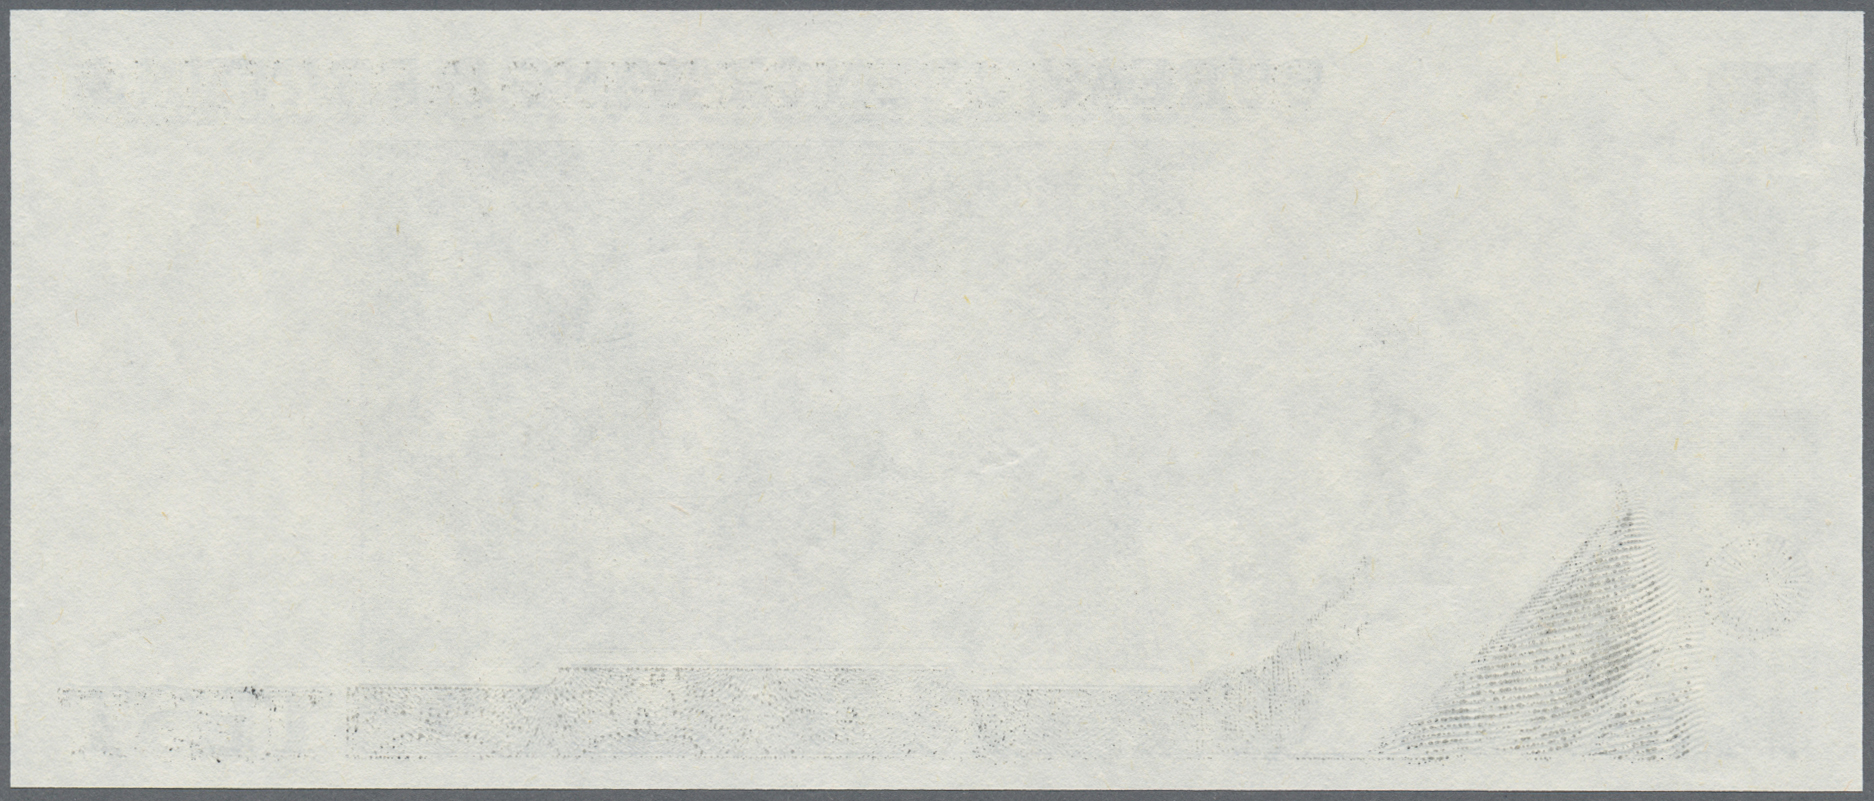 Lot 2310 - Testbanknoten   Banknoten  -  Auktionshaus Christoph Gärtner GmbH & Co. KG Banknotes & Coins Auction #39 Day 2